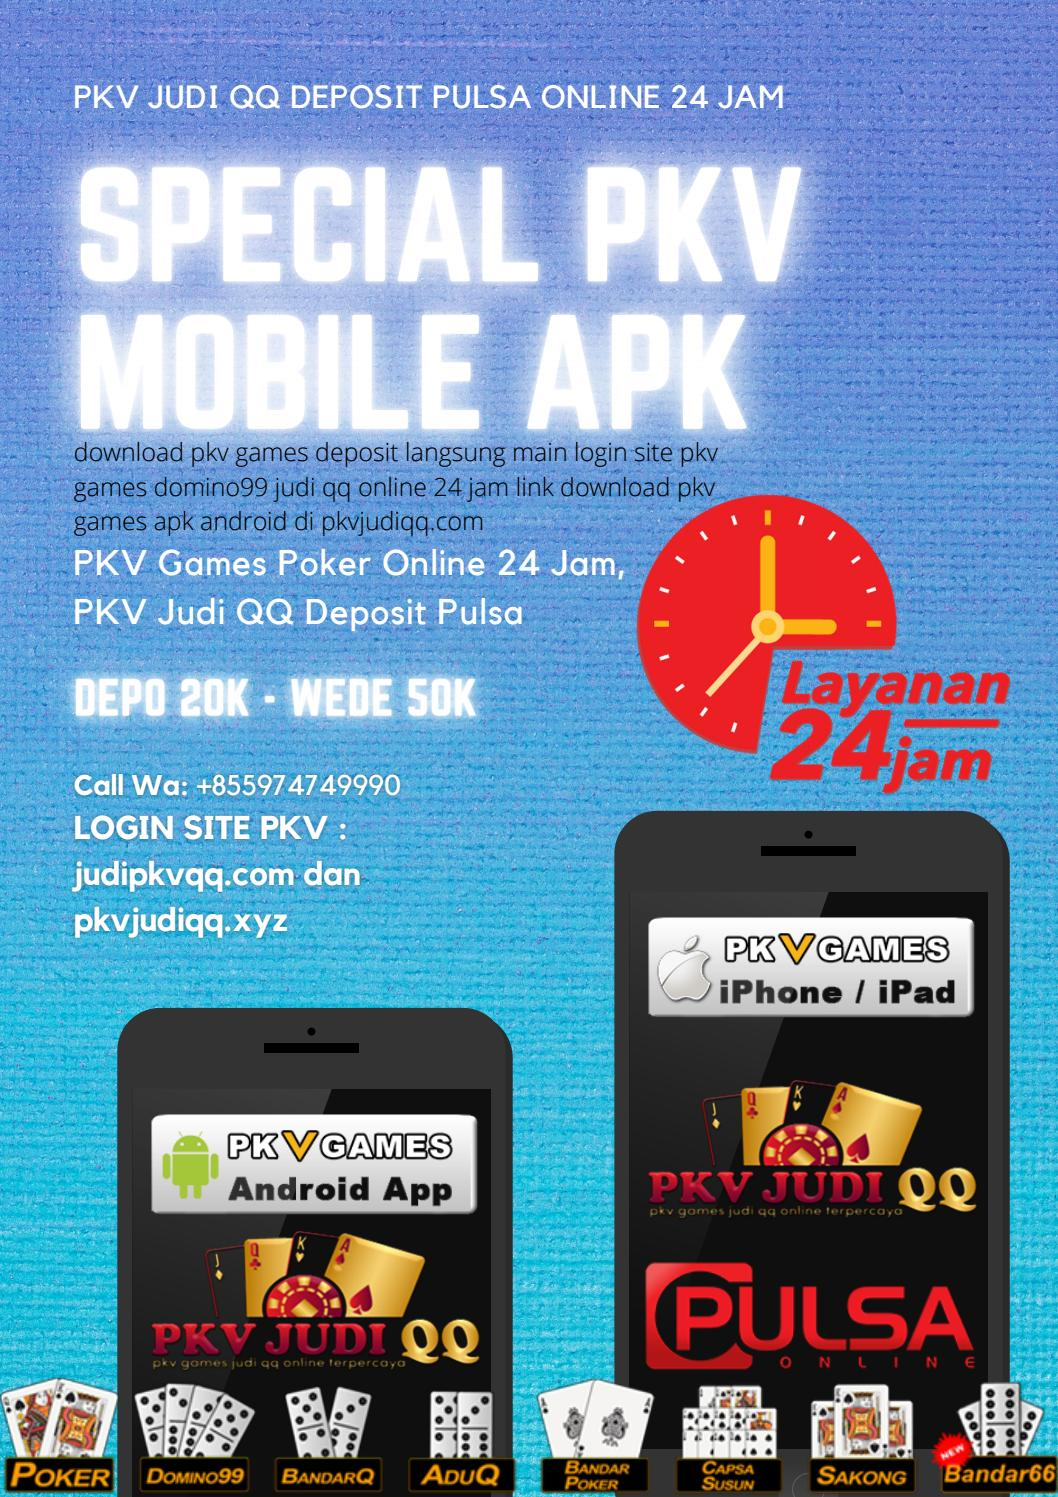 Pkv Judi Qq Deposit Pulsa Online 24 Jam Pkv Mobile Pkv Games Deposit By Pkv Judi Qq Pkv Mobile Pkv Games Deposit Issuu